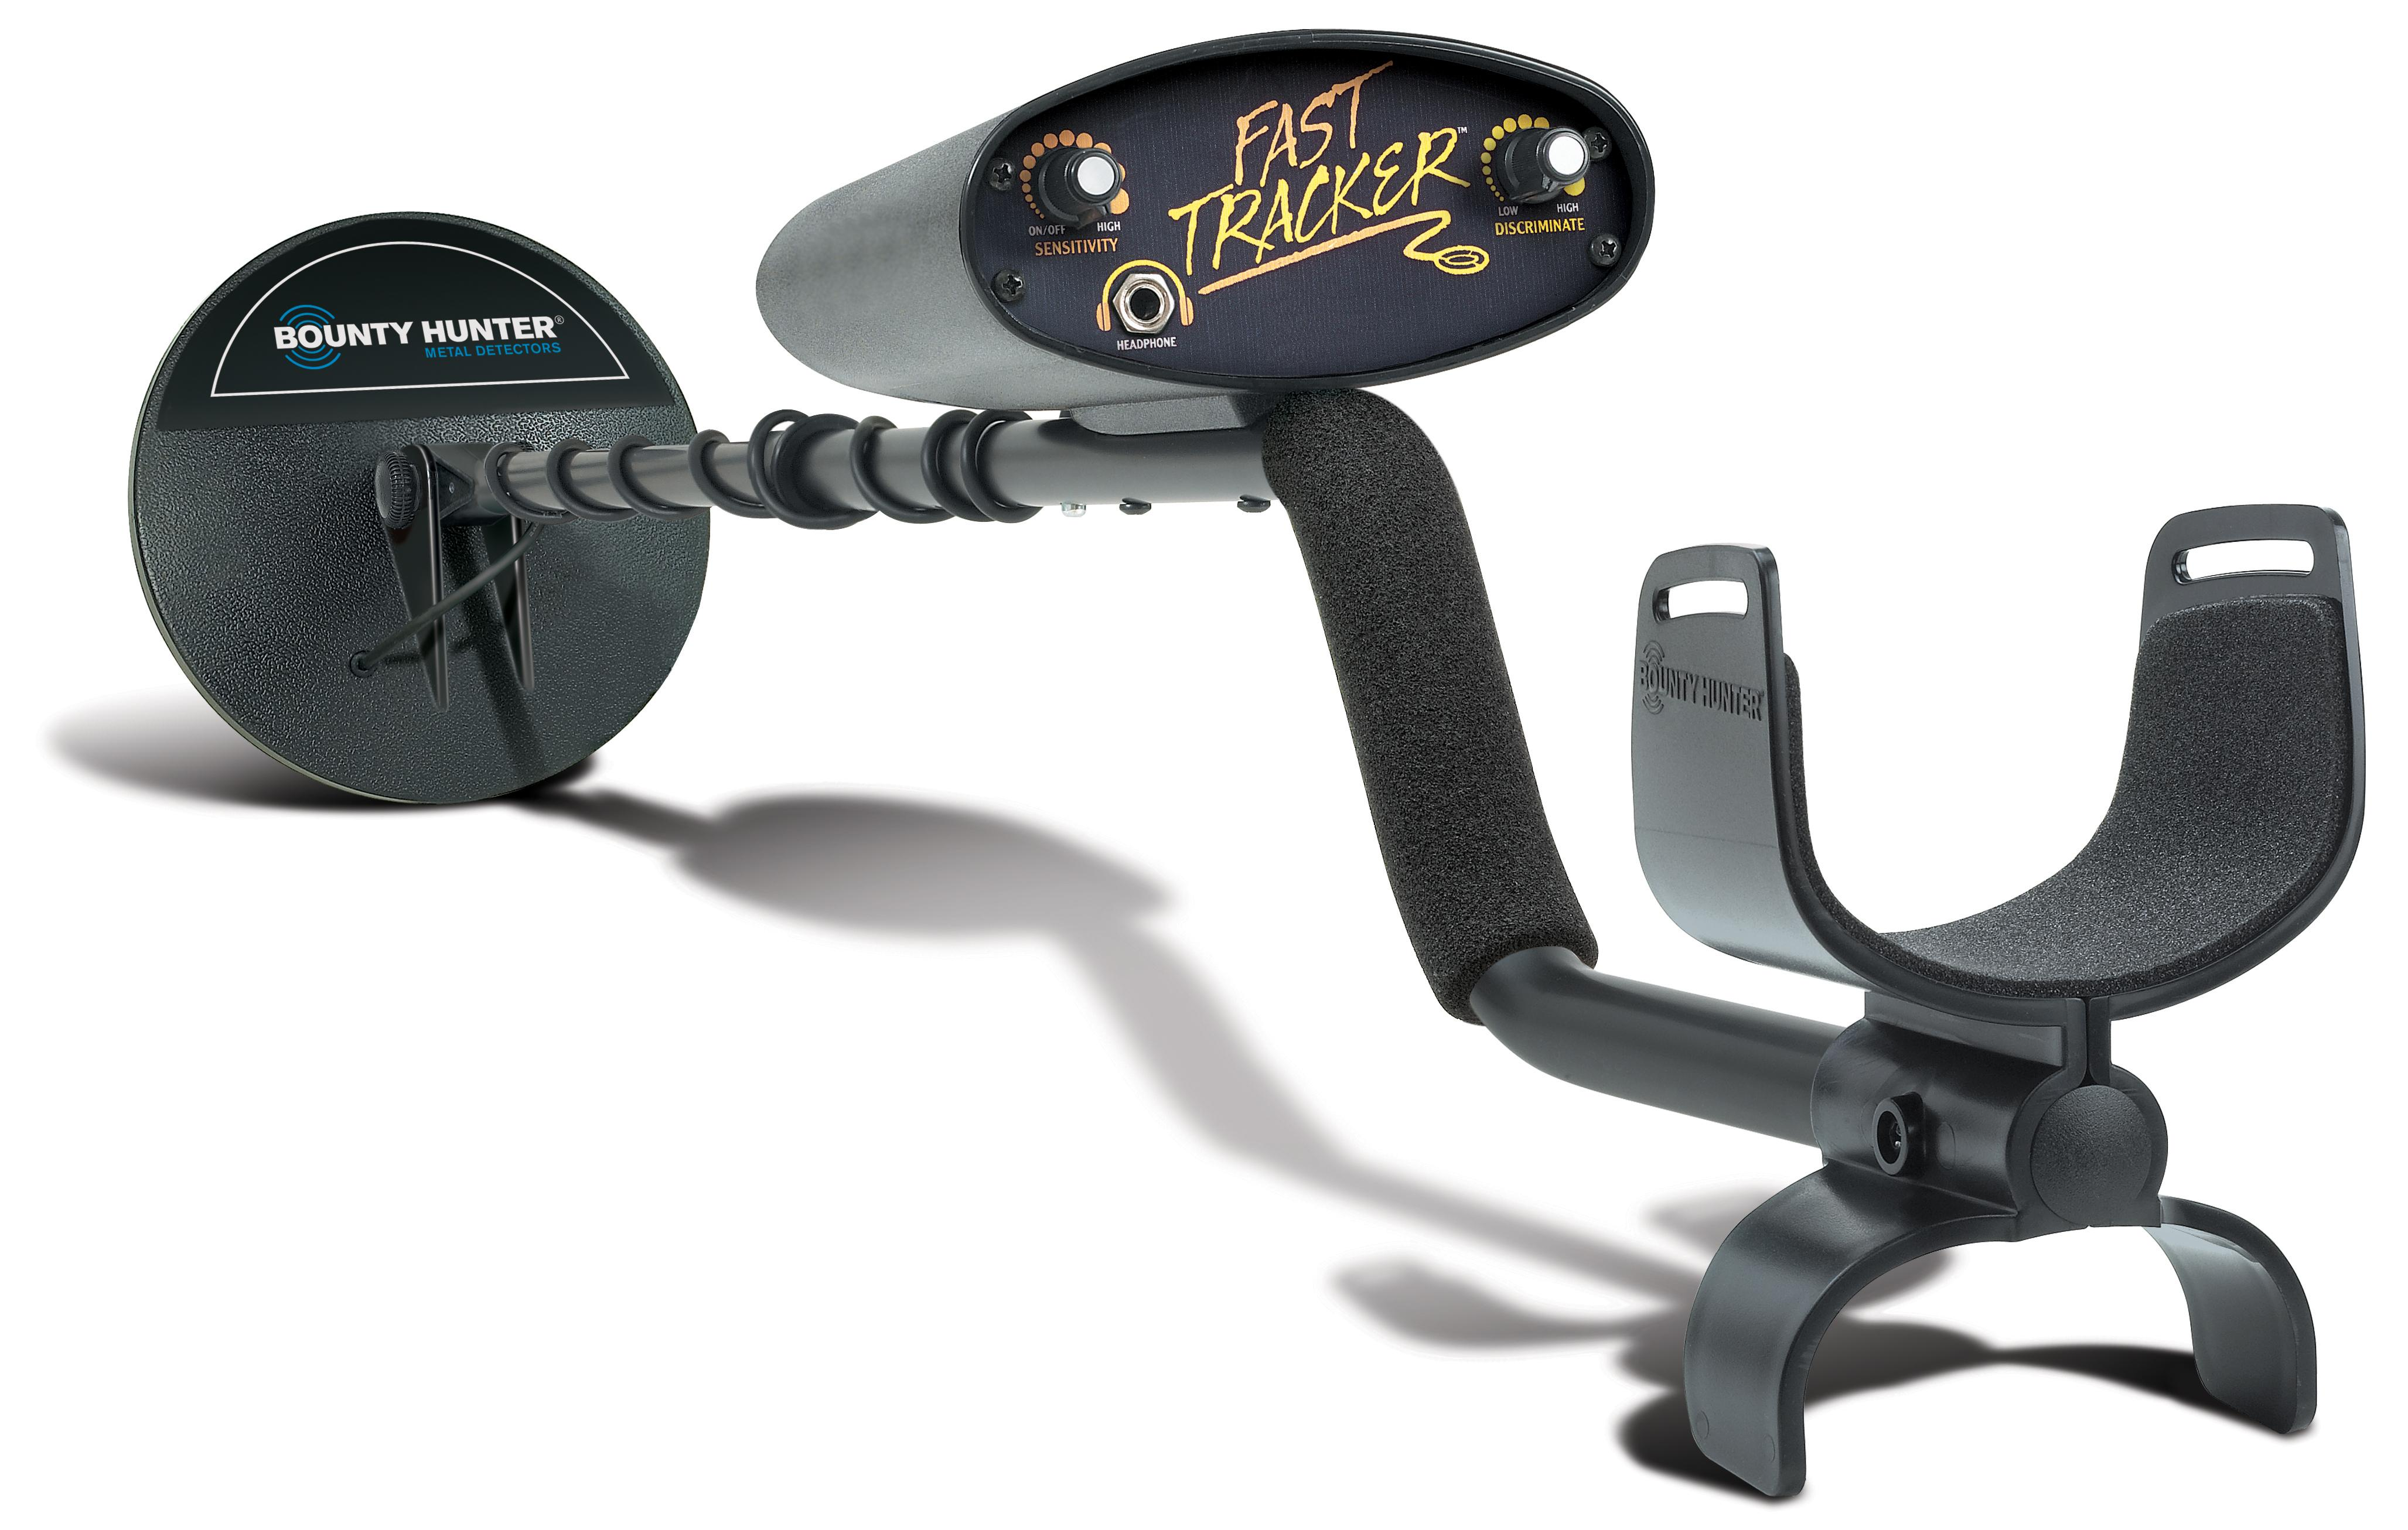 Bounty Hunter Fast Tracker металлоискатель металлодетектор грунтовый металлодетектор